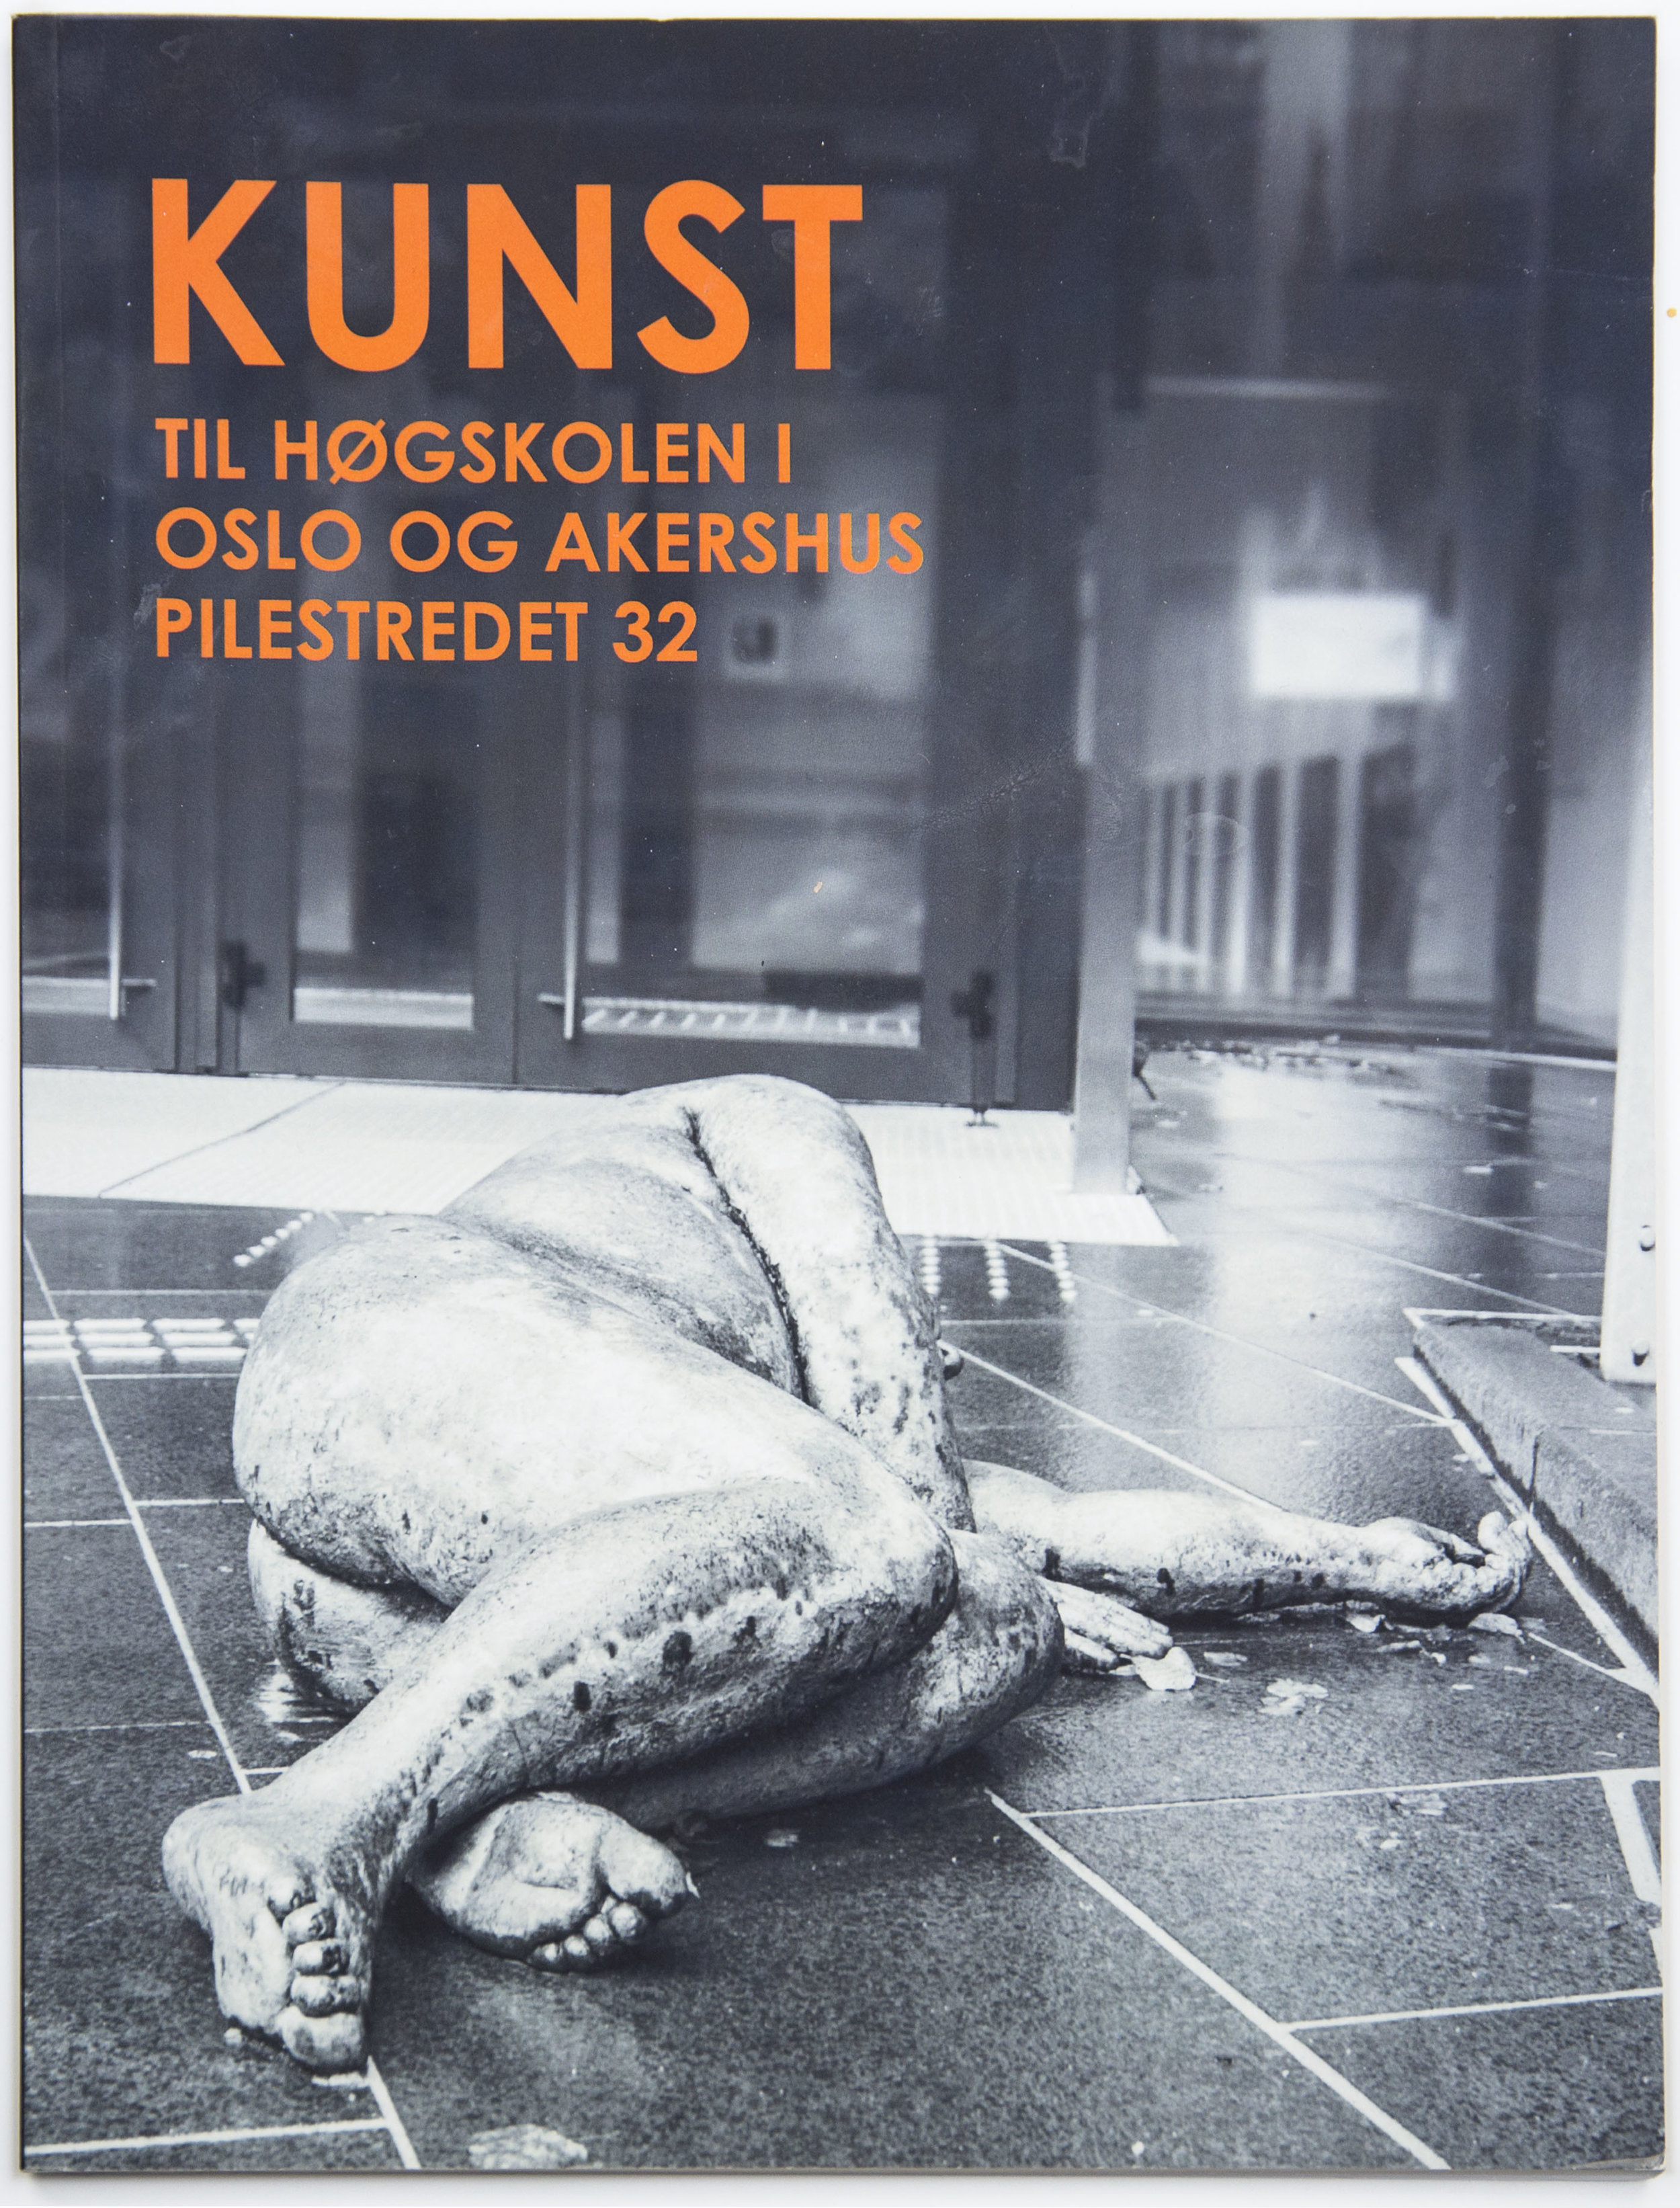 Design / photography for KUNST TIL HØGSKOLEN I OSLO OG AKERHUS PILESTREDET 32 (2017)